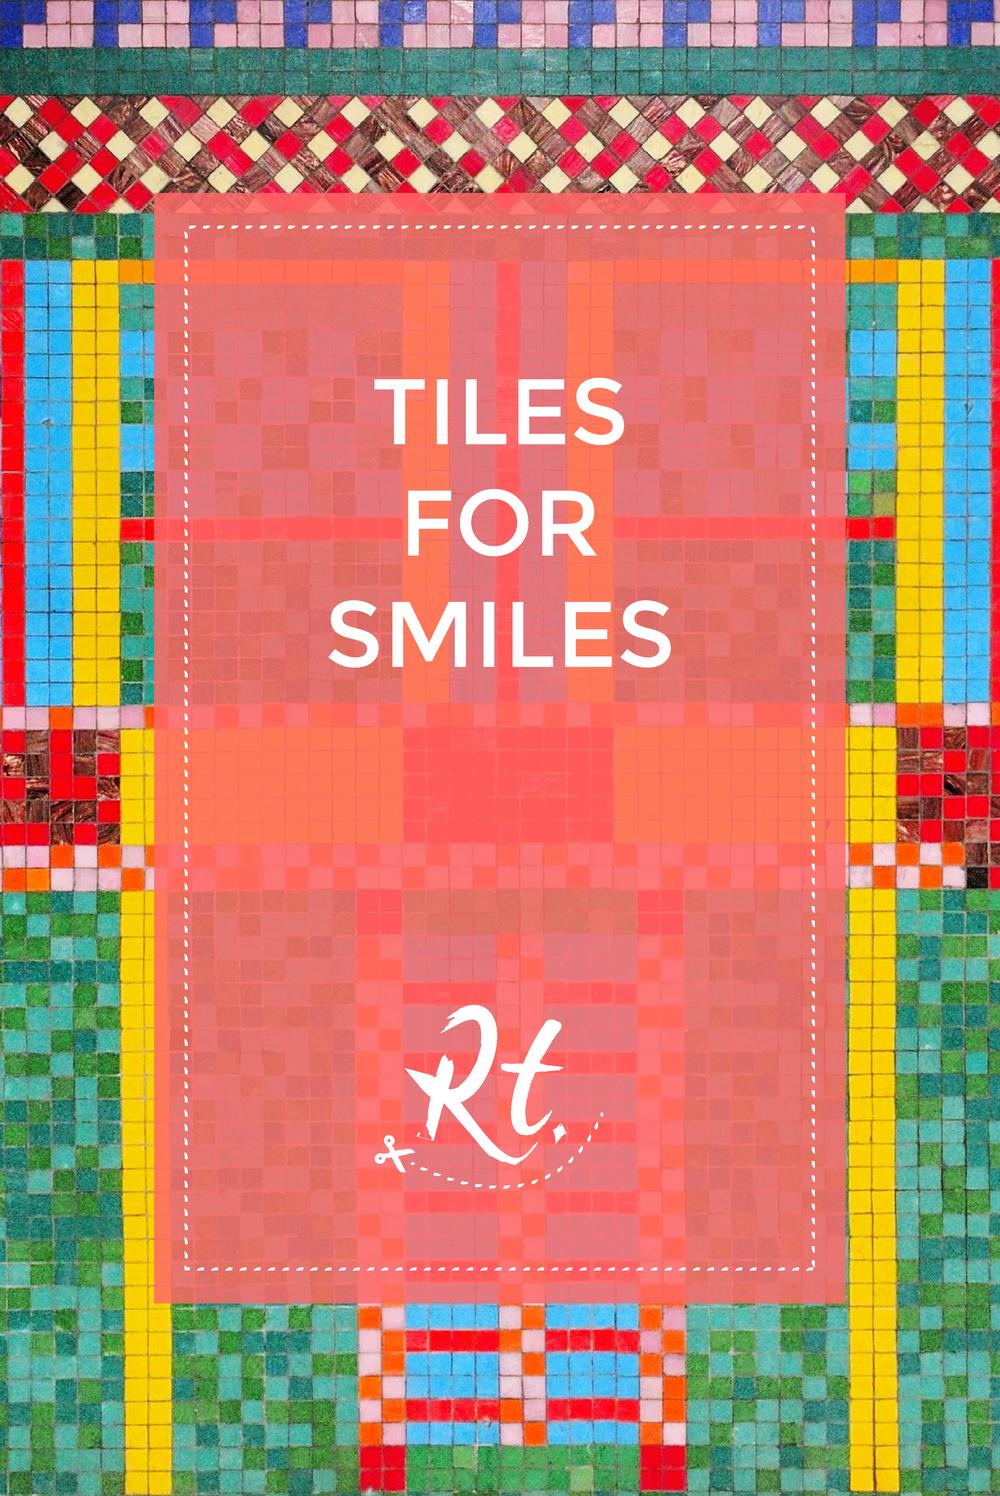 Tiles for Smiles by Rosh Thanki, Eduardo Paolozzi tiles at Tottenham Court Road tube station